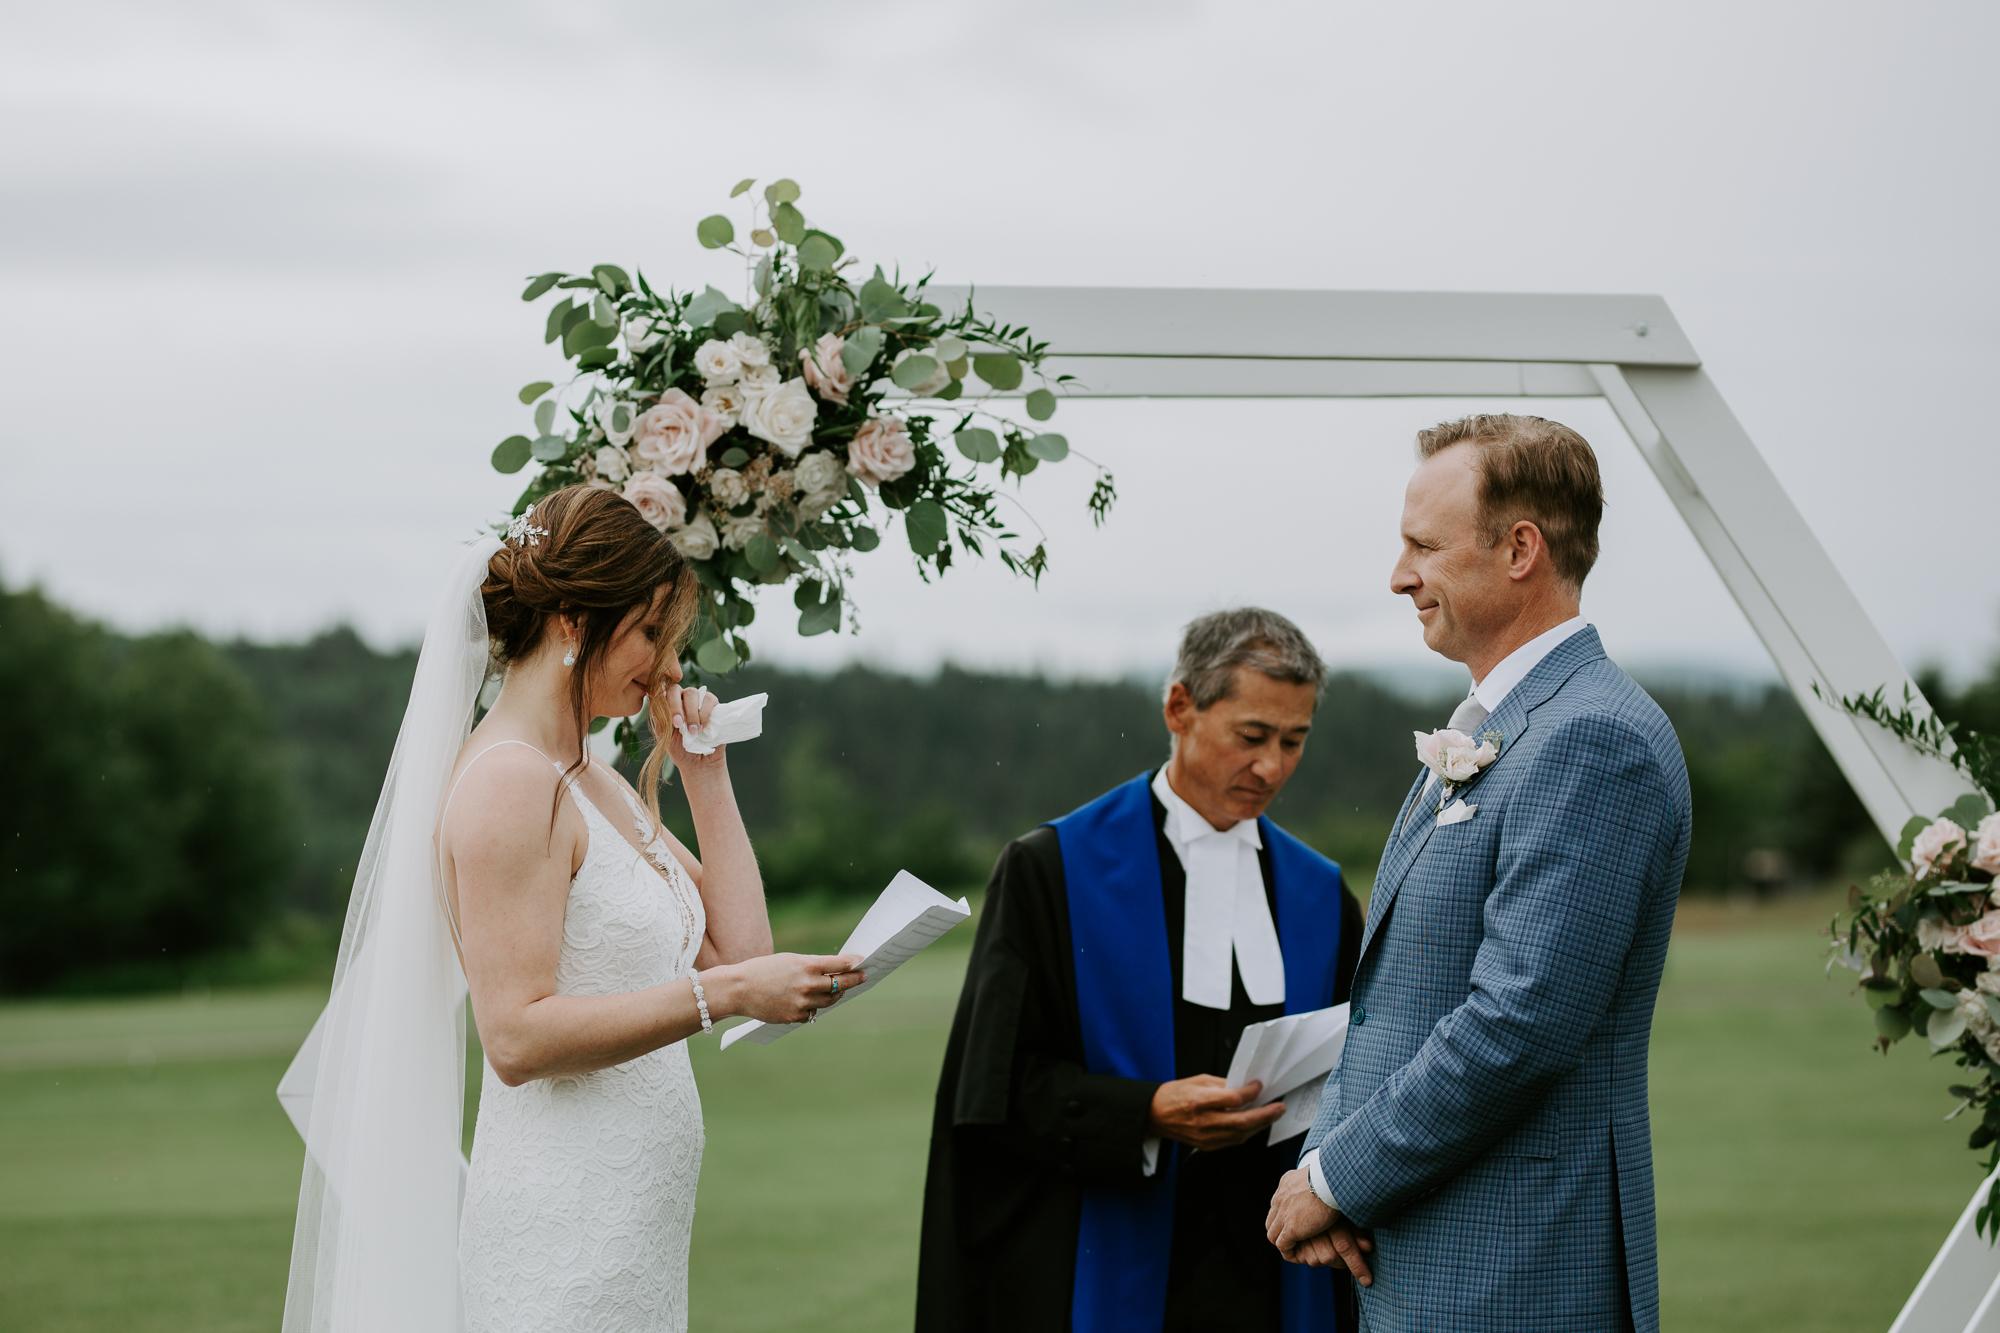 Priddis-Wedding-Photographer-JG-25.jpg